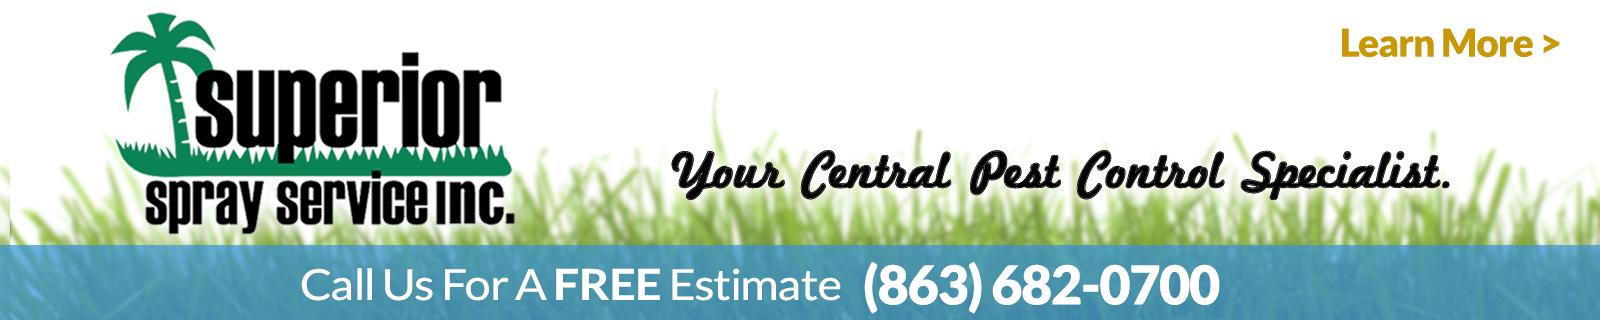 Pest control Lawn Care Superior Spray lakeland fl